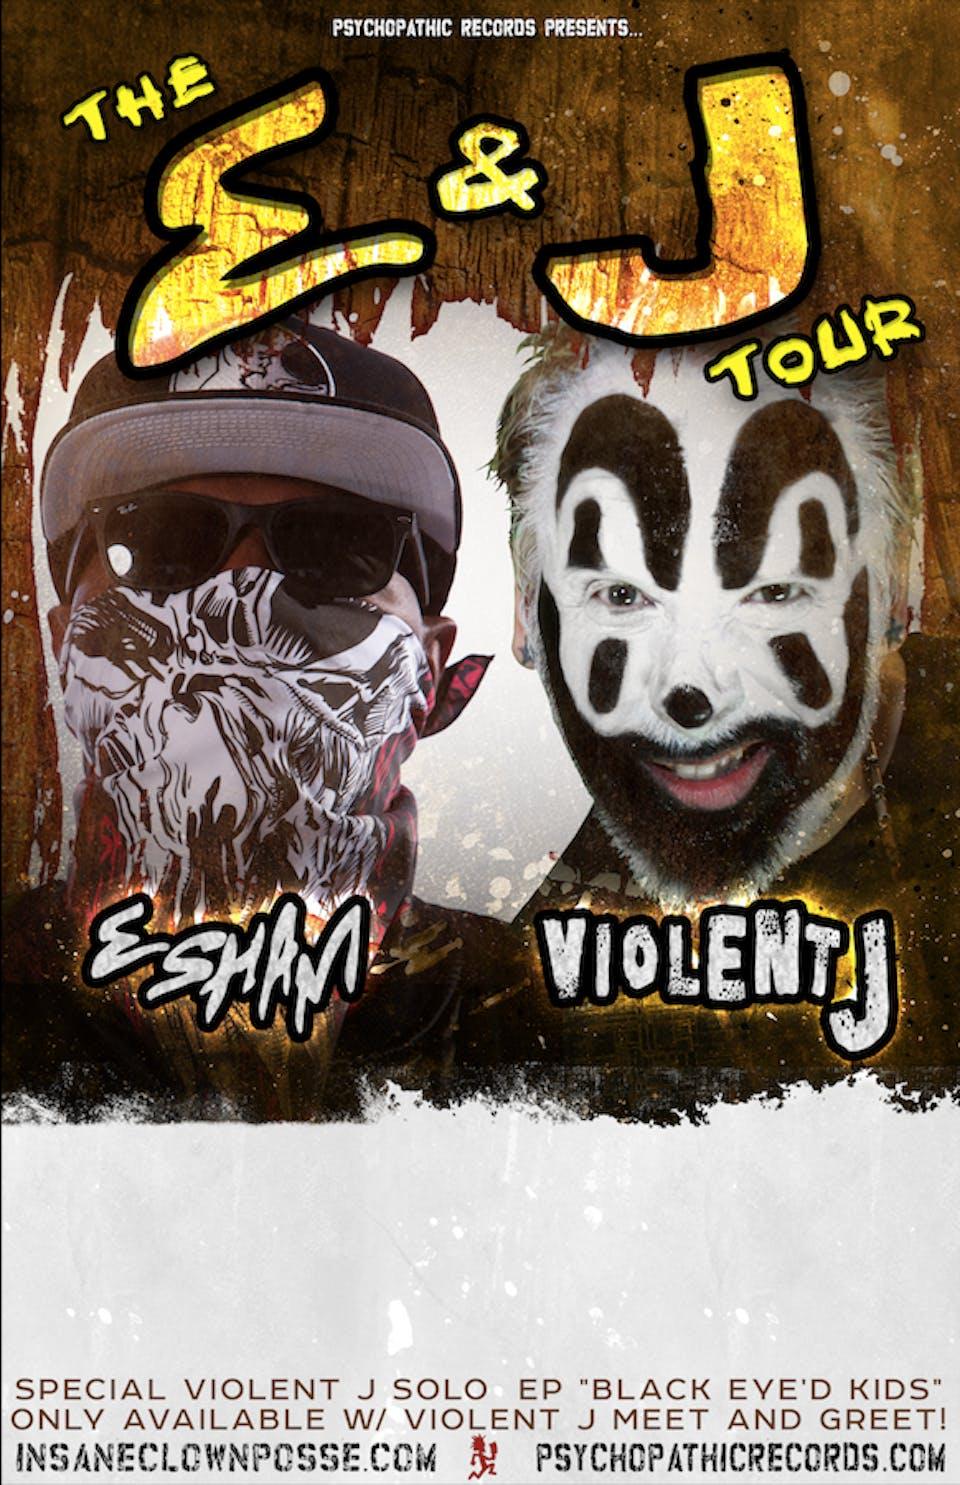 Insane Clown Posse's VIOLENT J with ESHAM and more